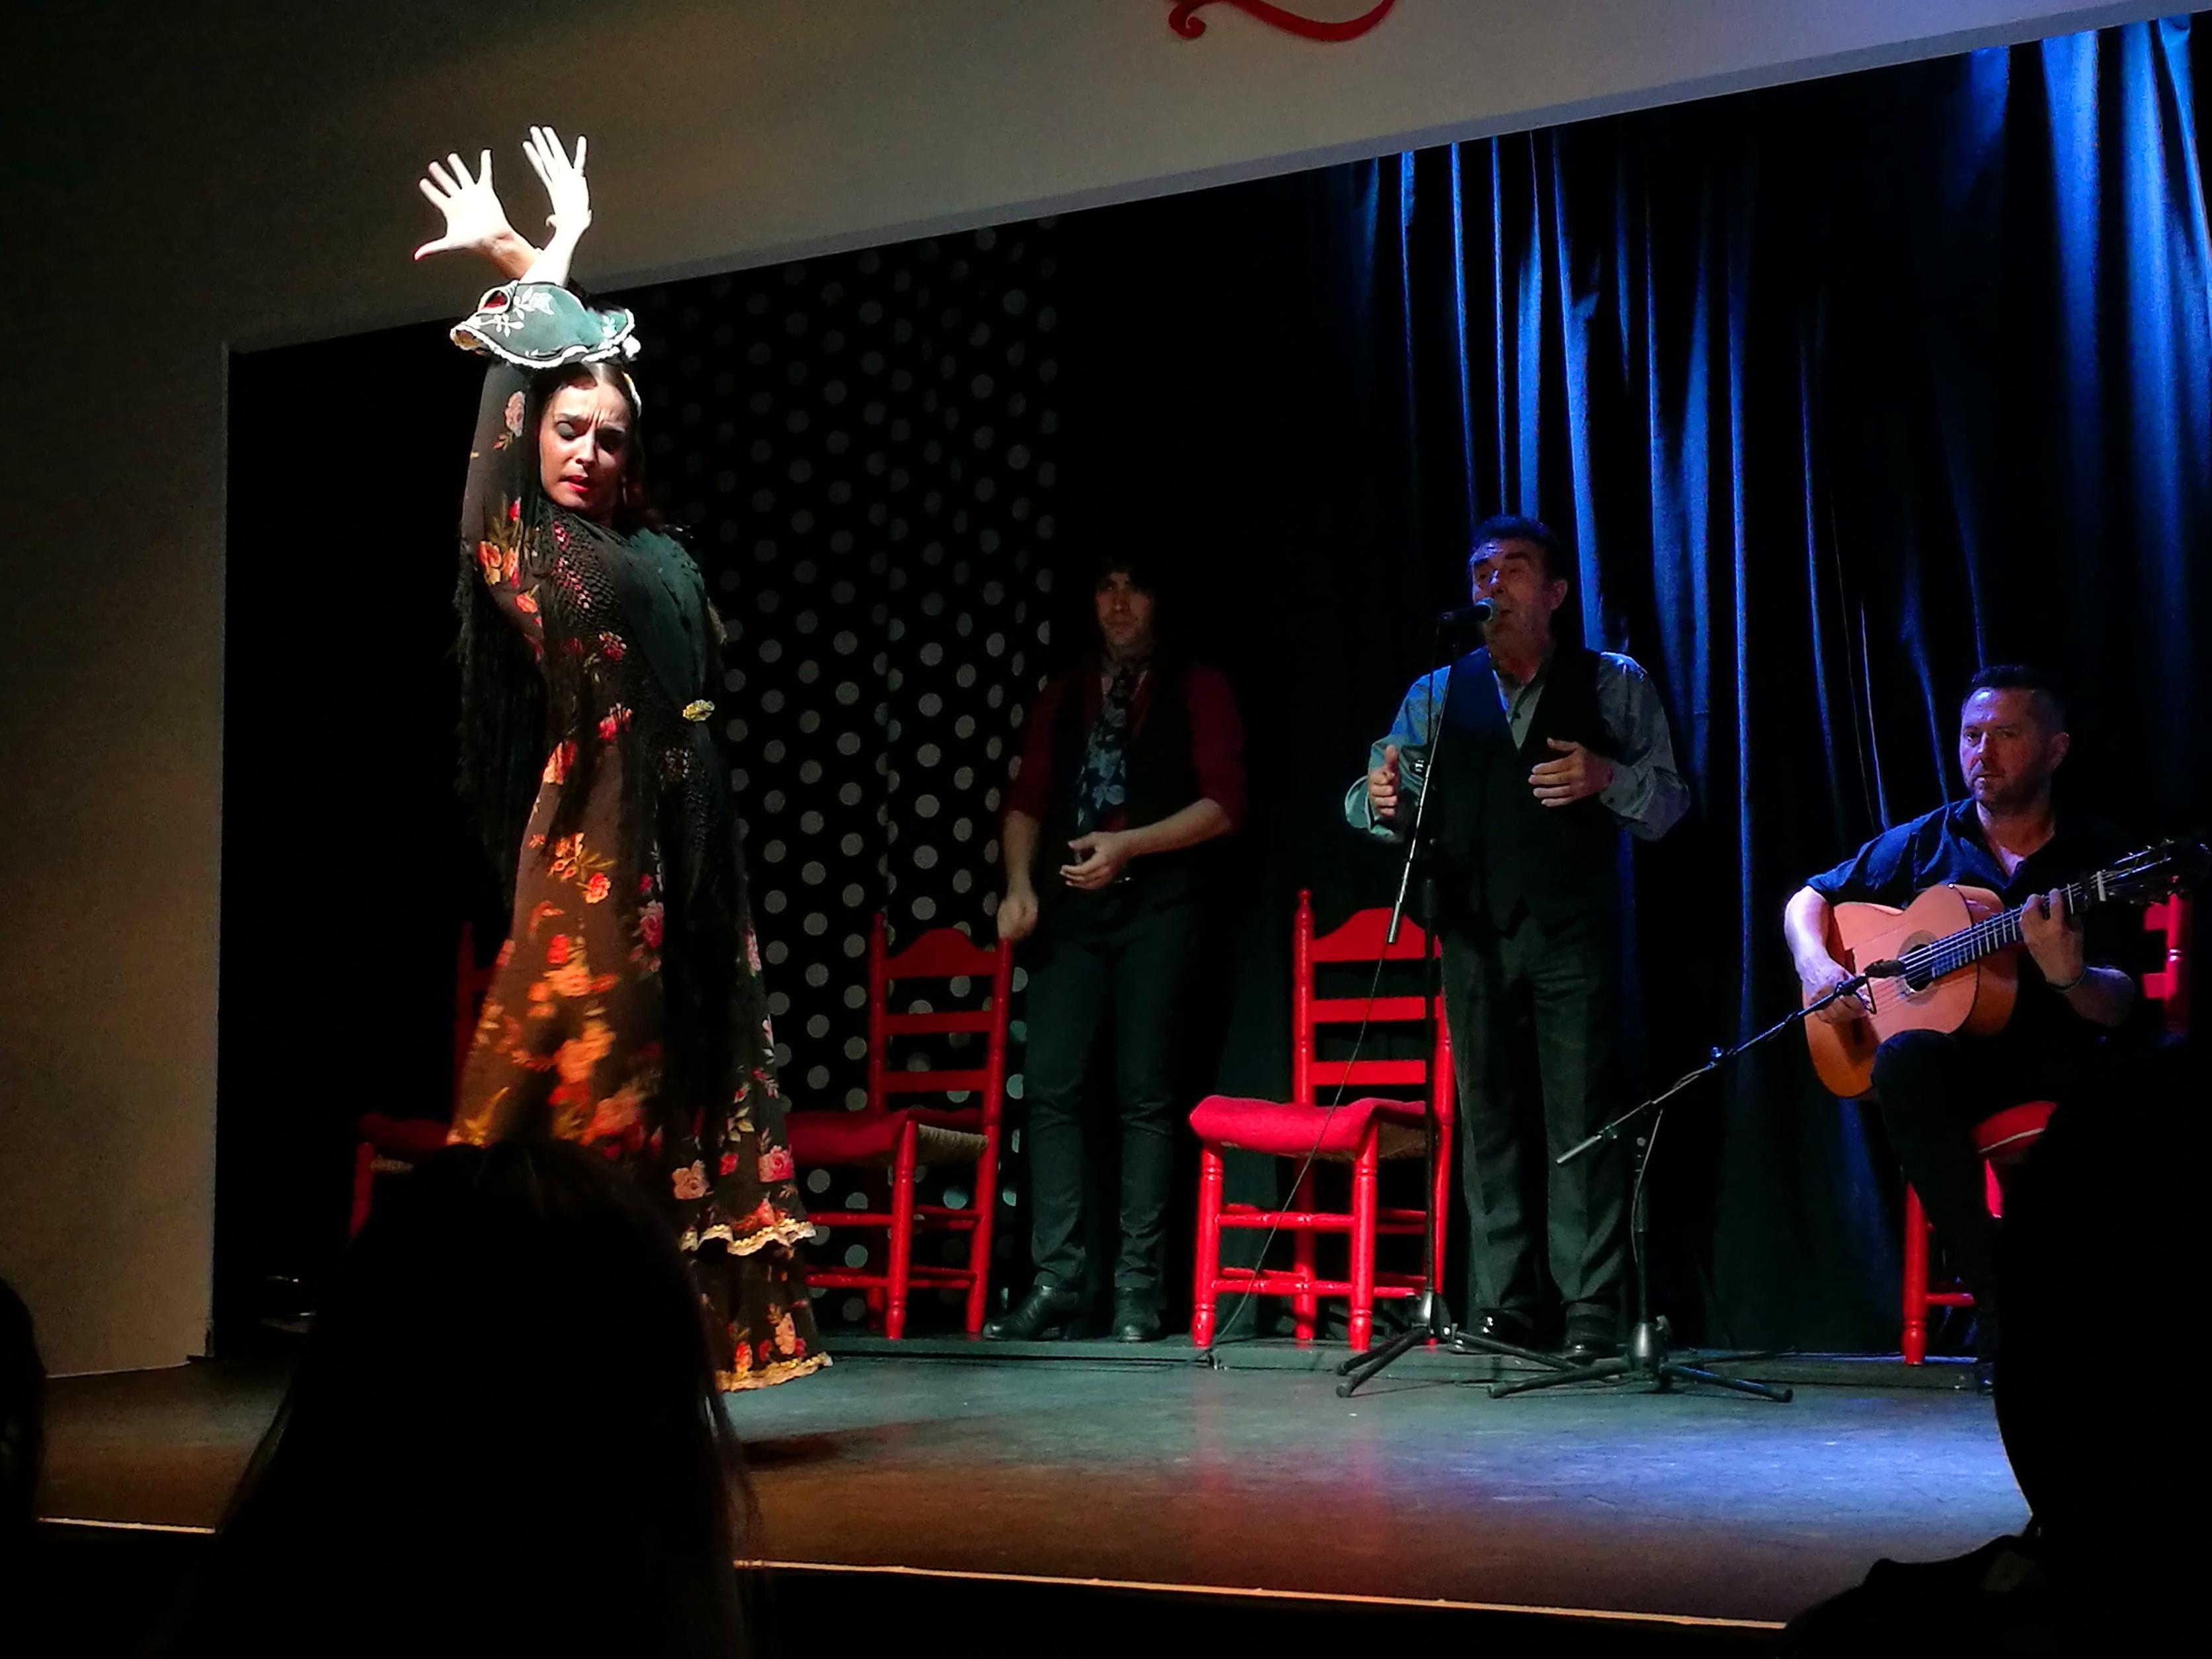 Proctor en Segovia watches flamenco at a tablao in Triana